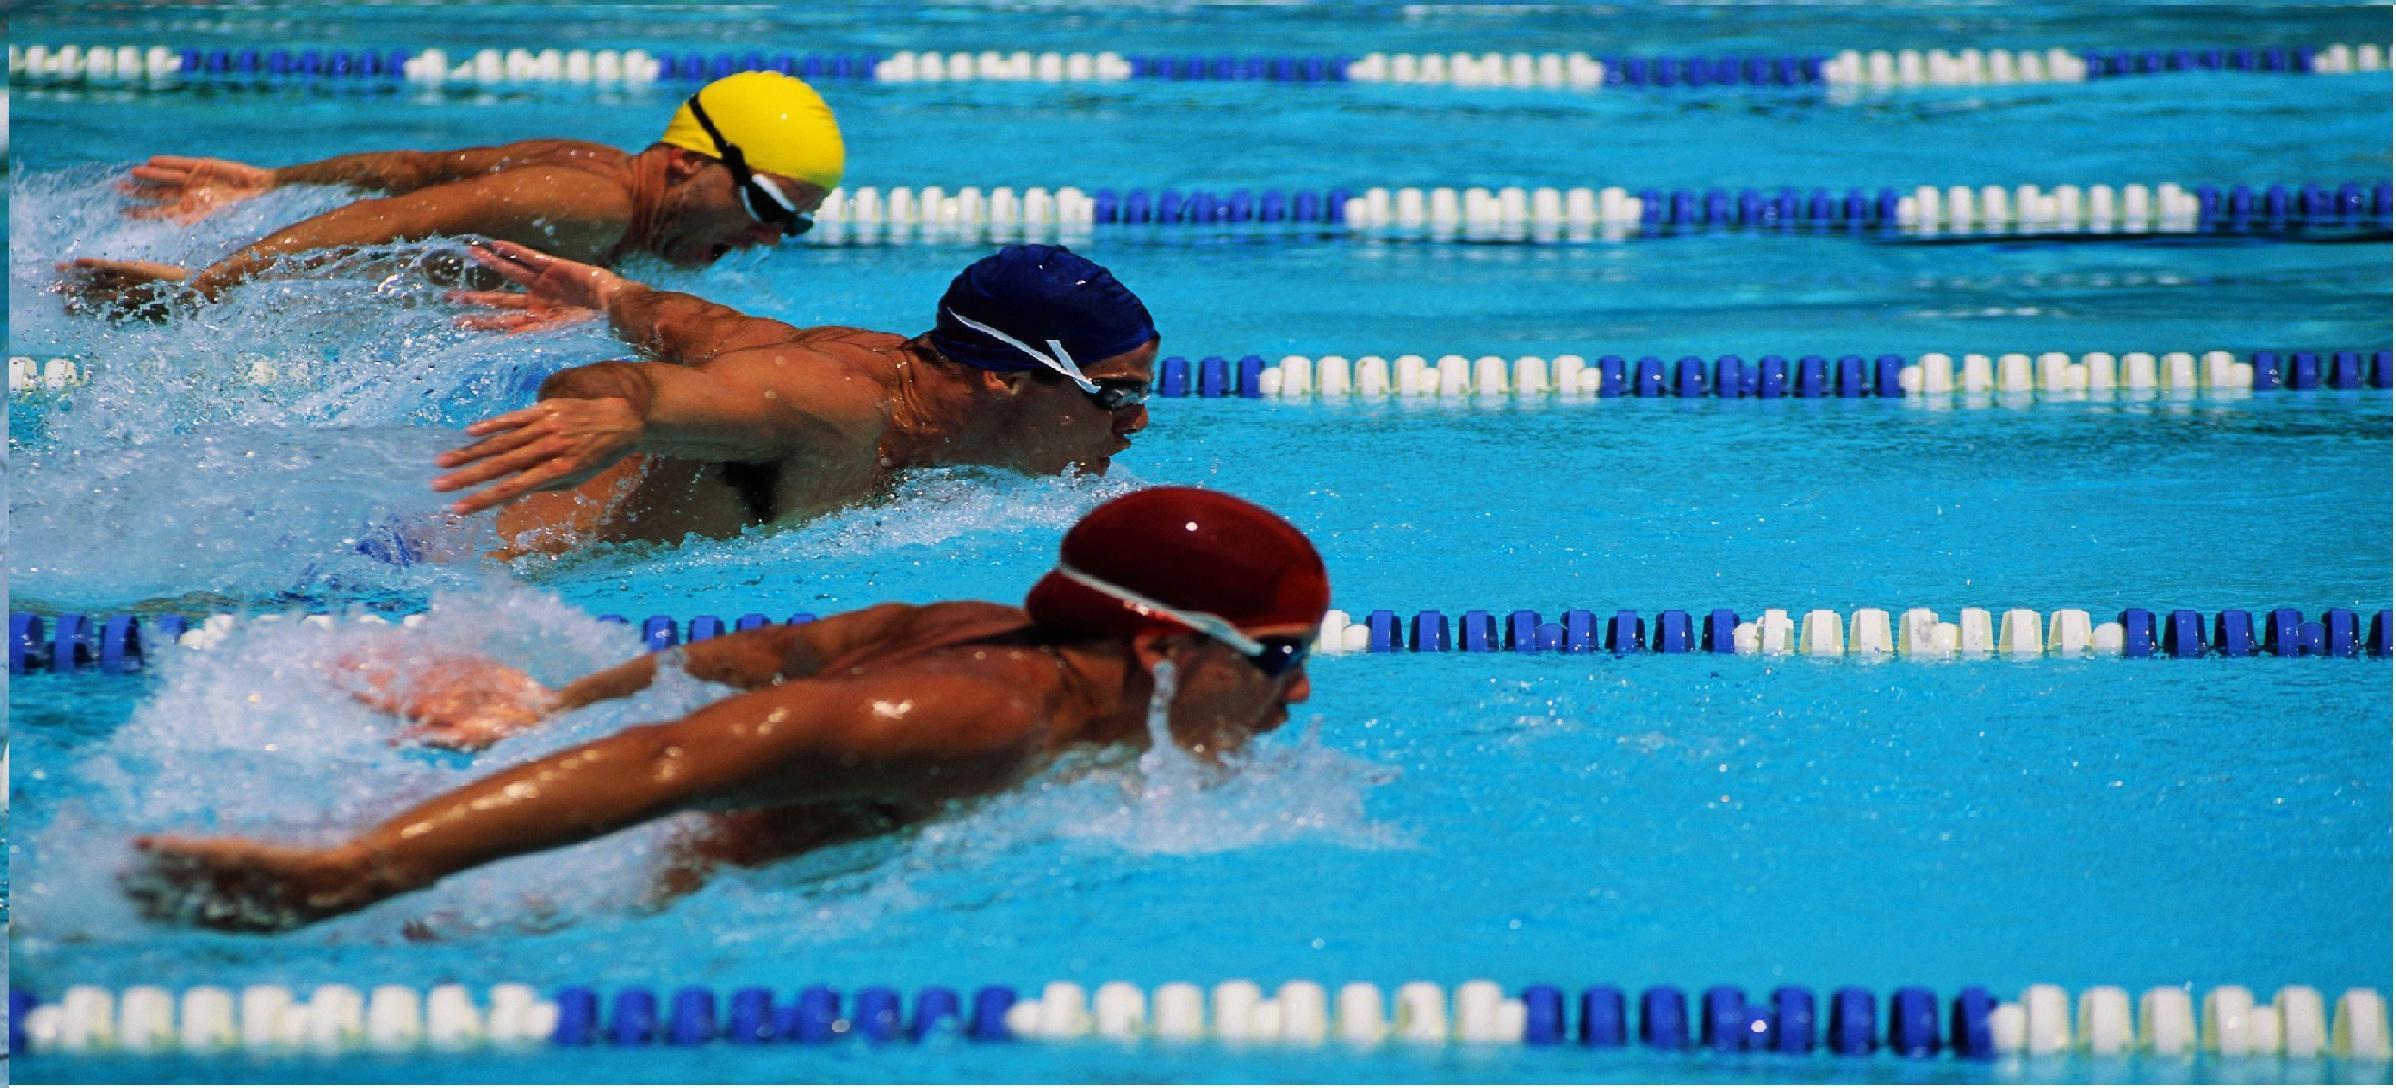 bc provincial swim meet 2013 honda